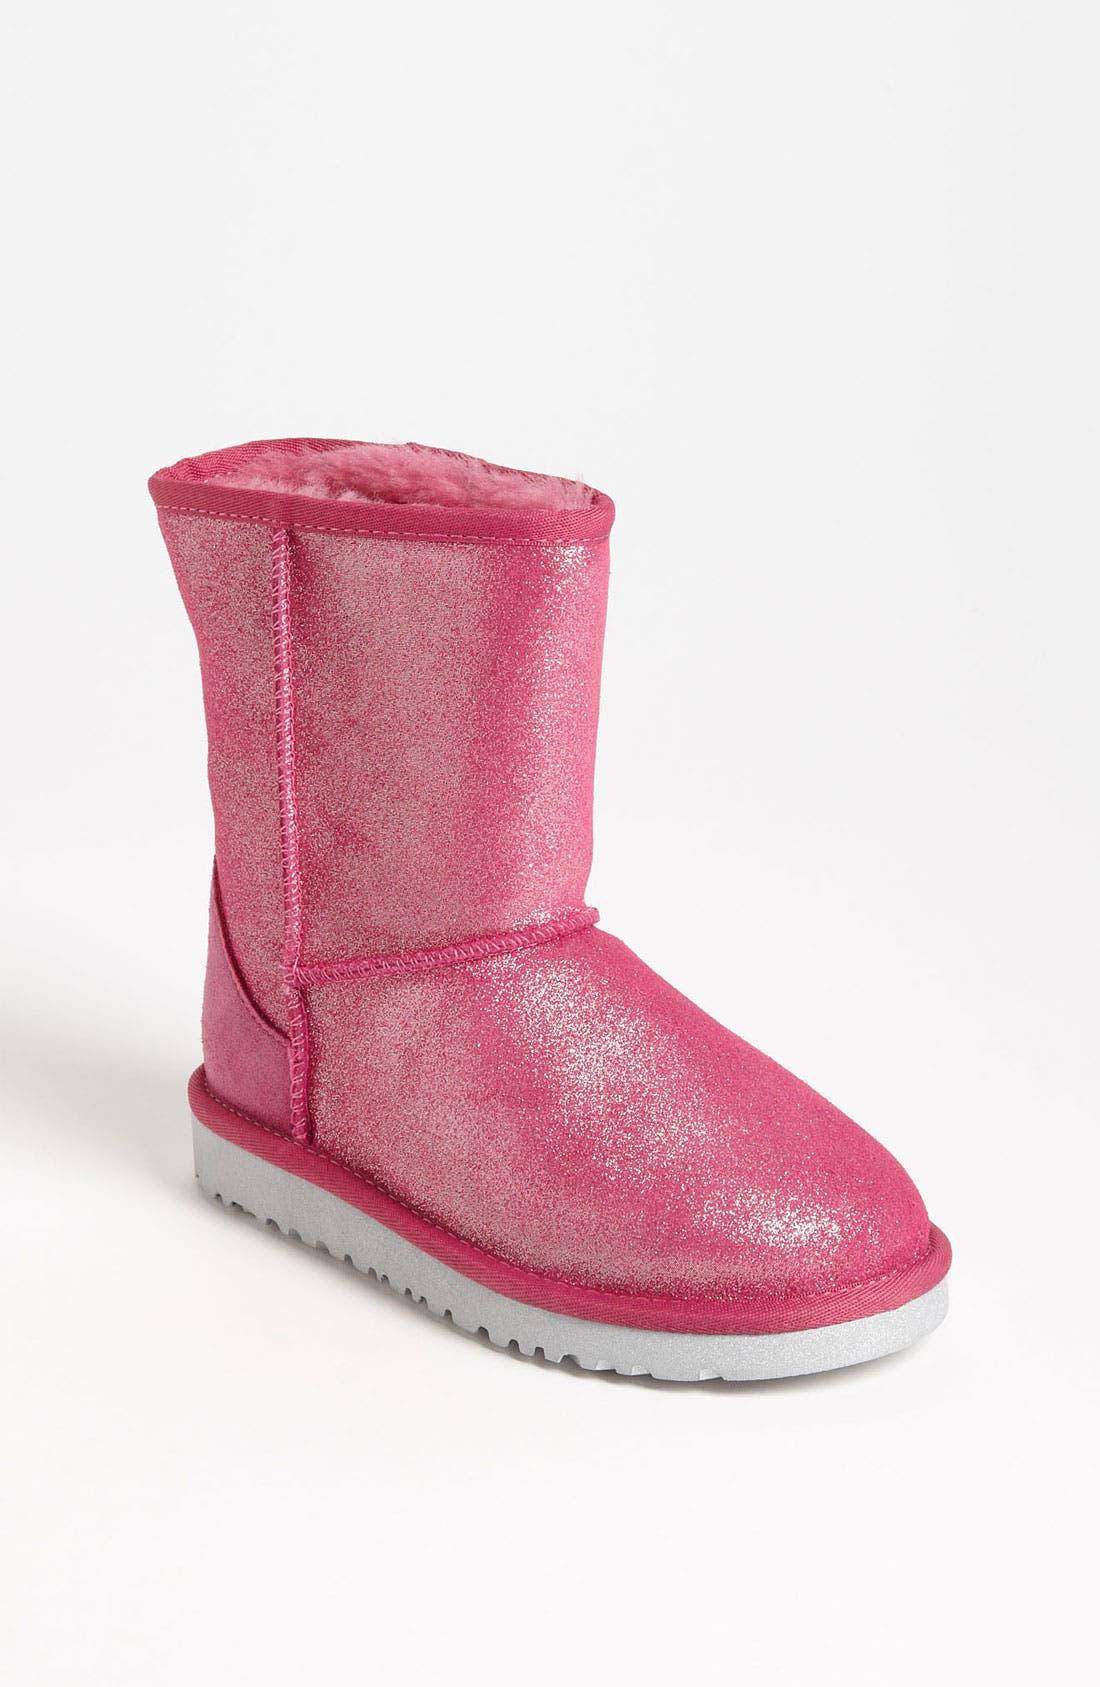 Alternate Image 1 Selected - UGG® Australia 'Classic Glitter' Boot (Walker, Toddler, Little Kid & Big Kid)